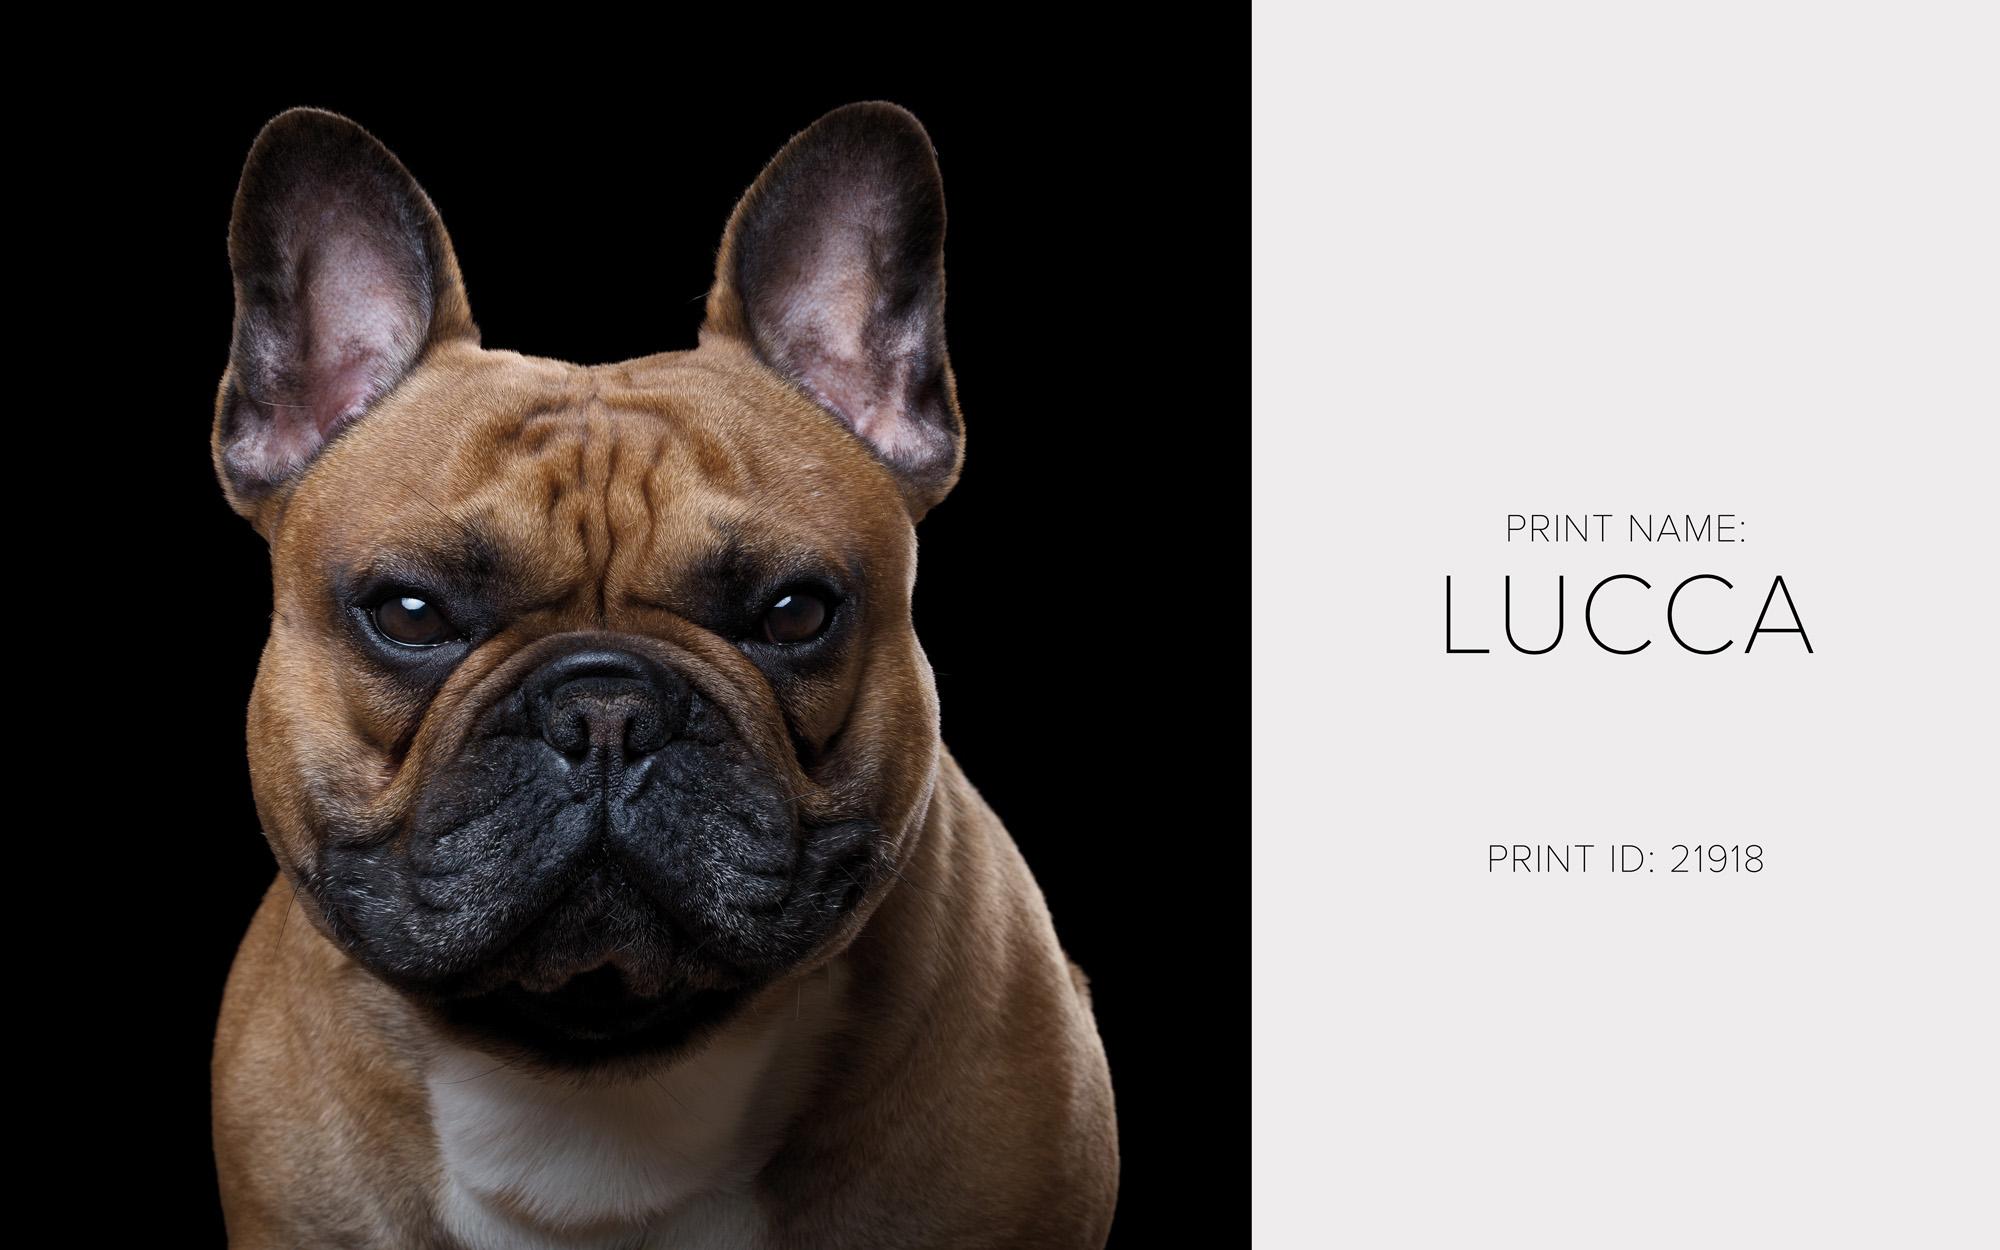 Lucca_Thumb.jpg